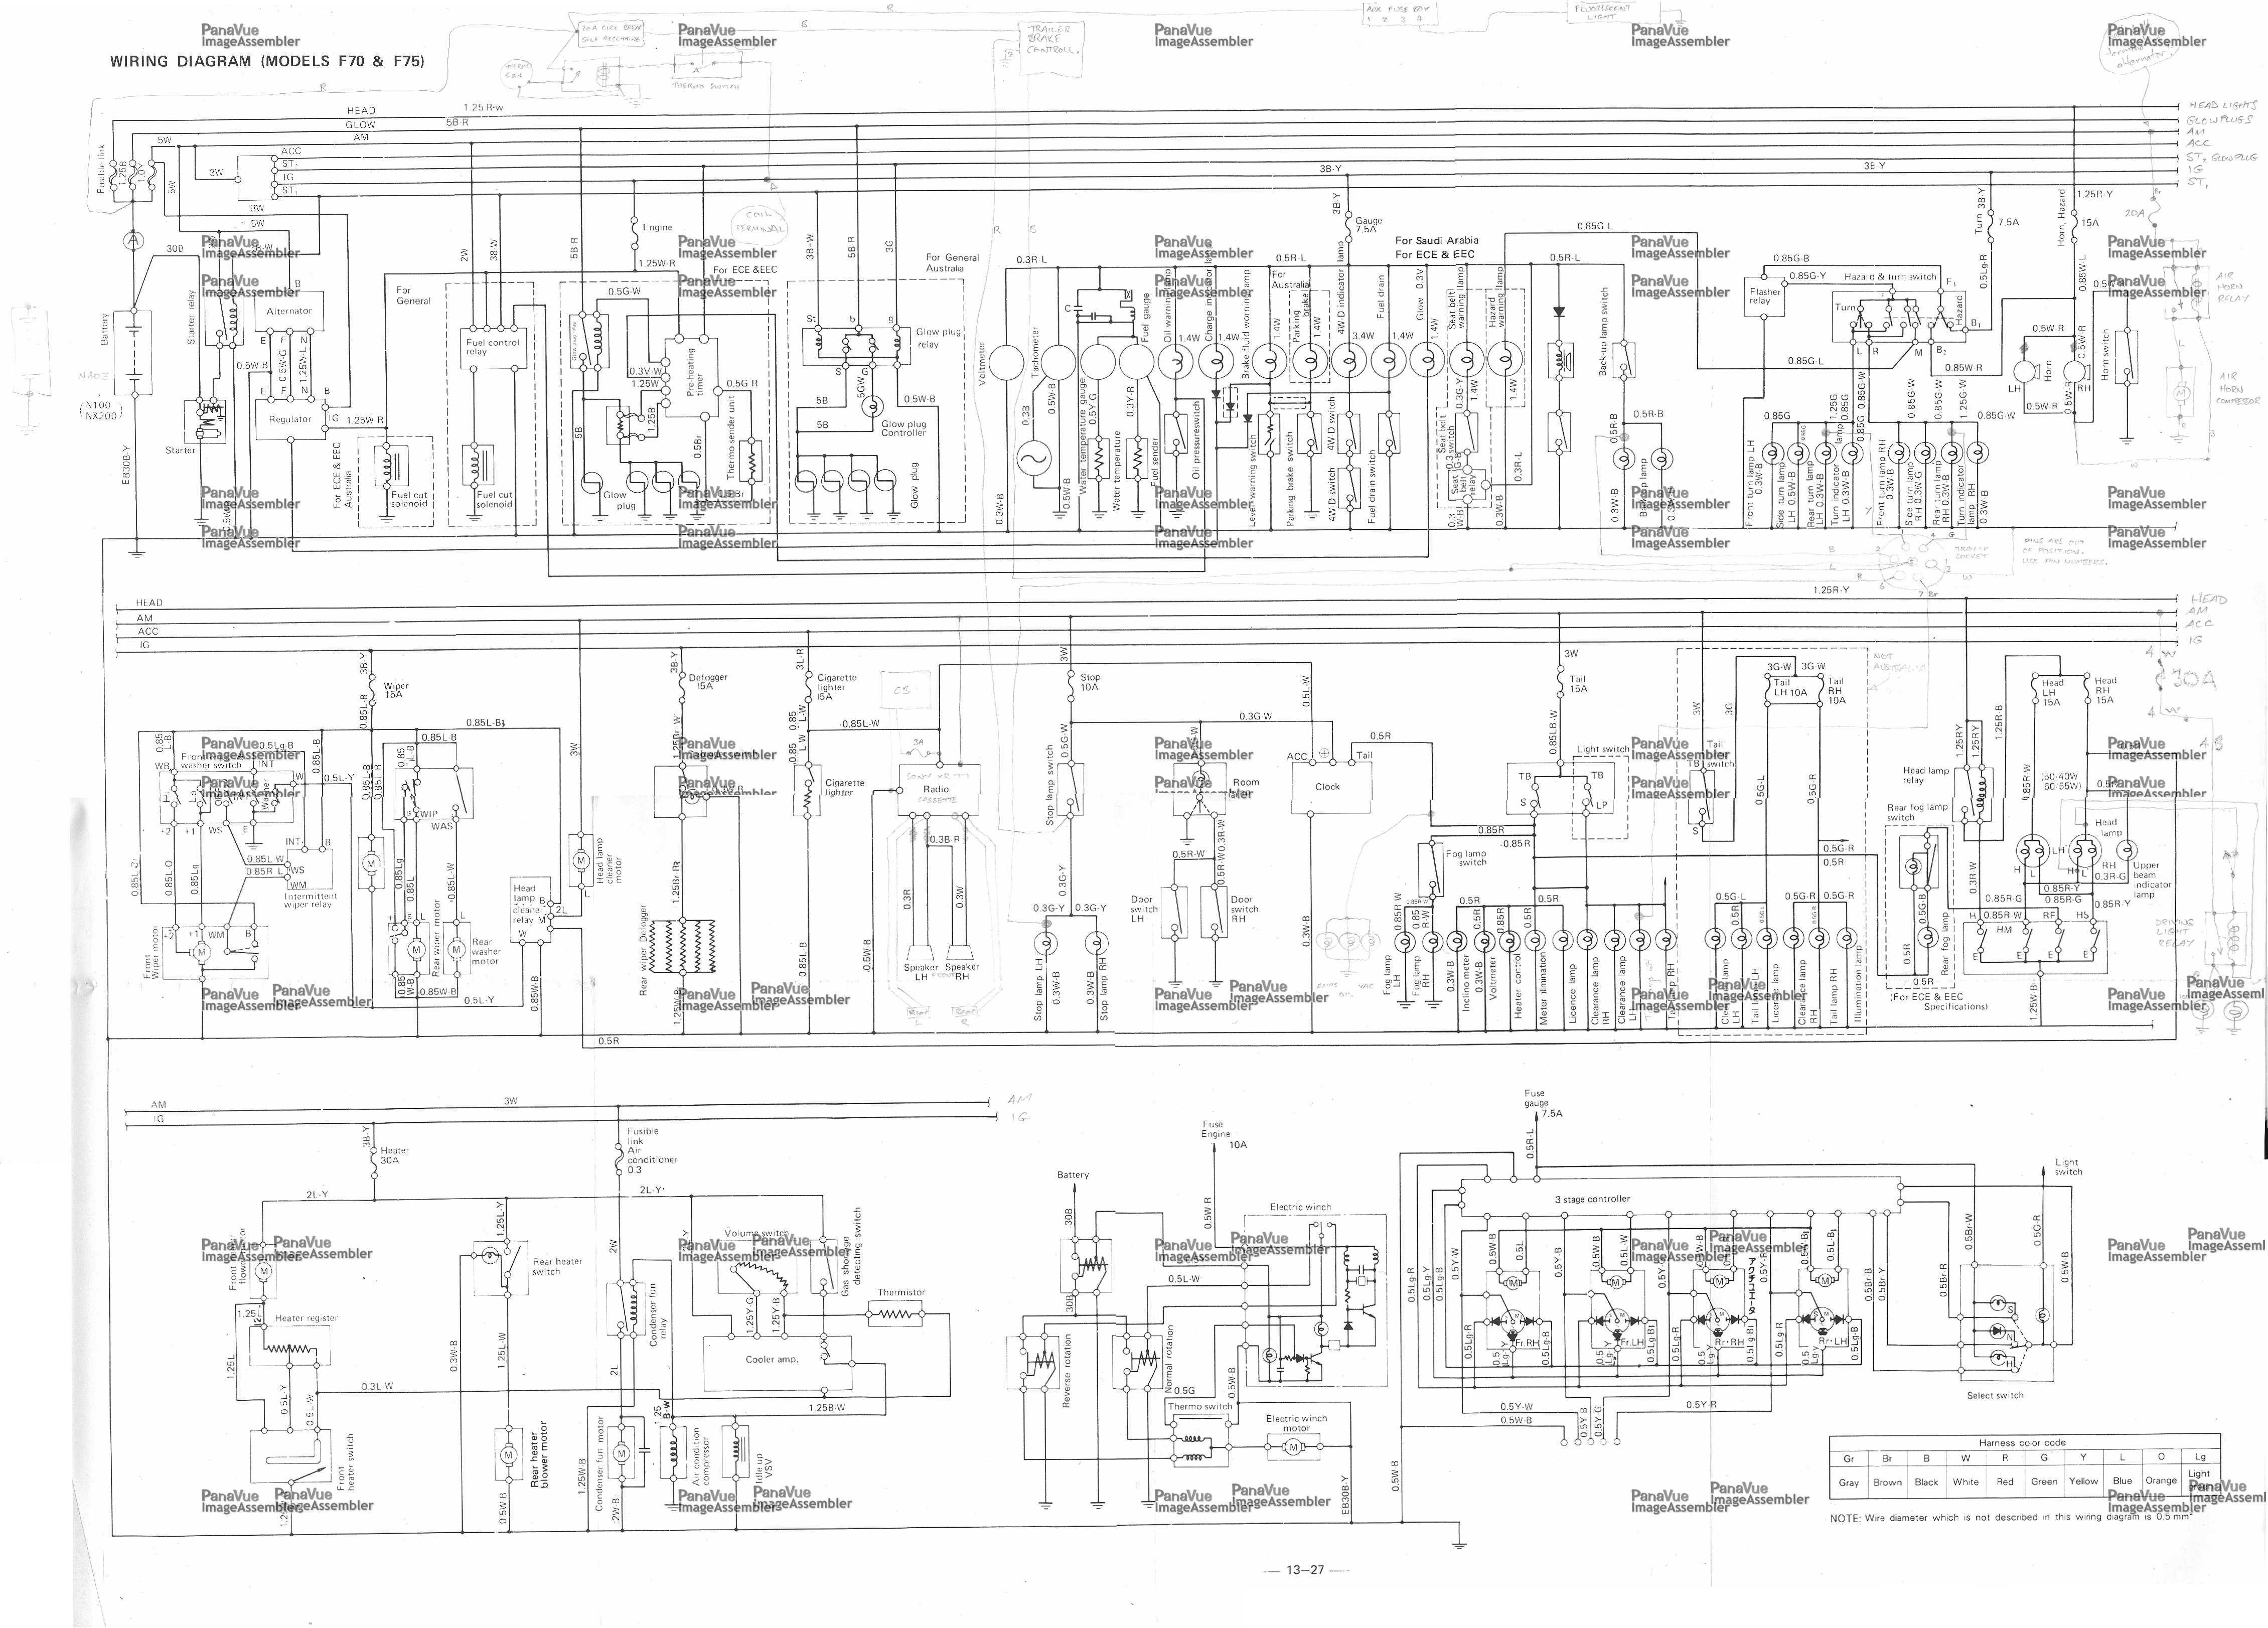 Fiat Multipla Wiring Diagram Pdf Trusted Diagrams Auto Color Code Electrical Schematics Terrific Doblo Ideas Best Image Rh Cashsigns Us 1969 500